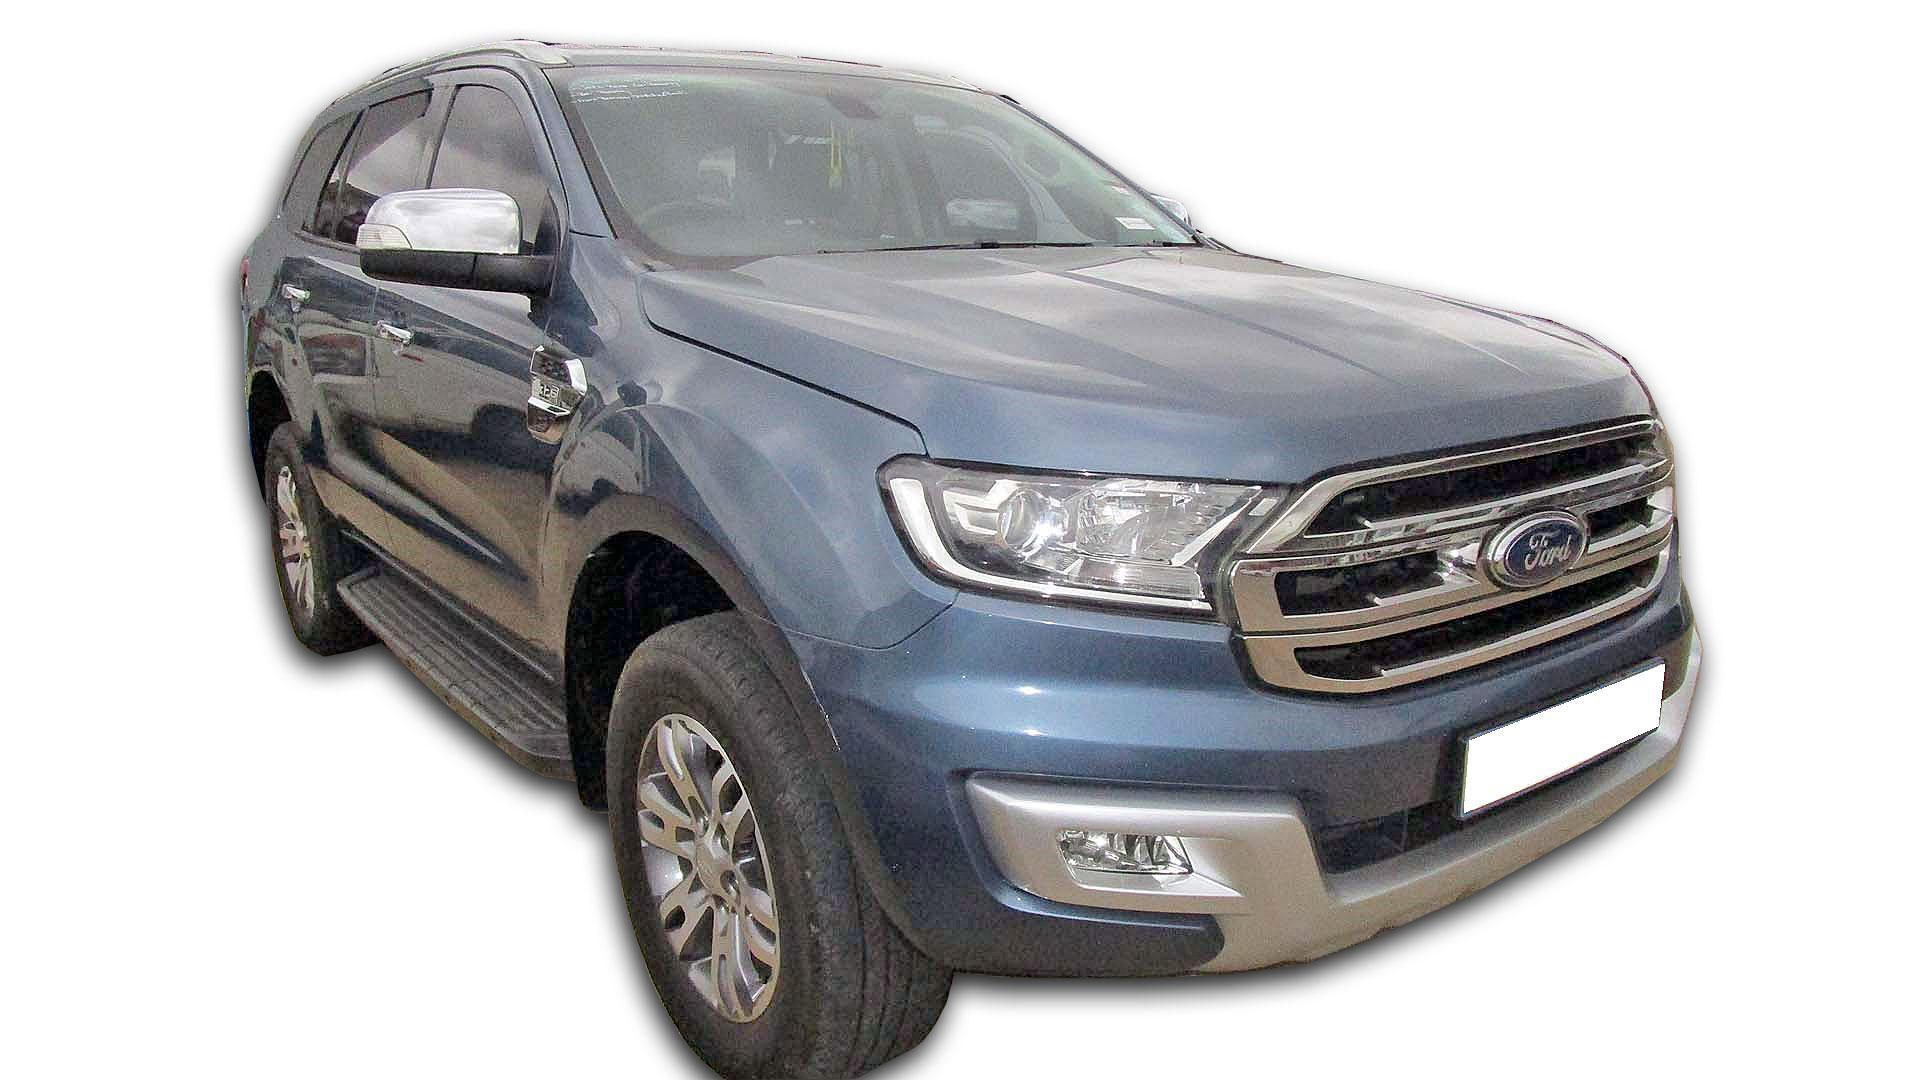 Ford Everest 3.2 Tdci XLT 4